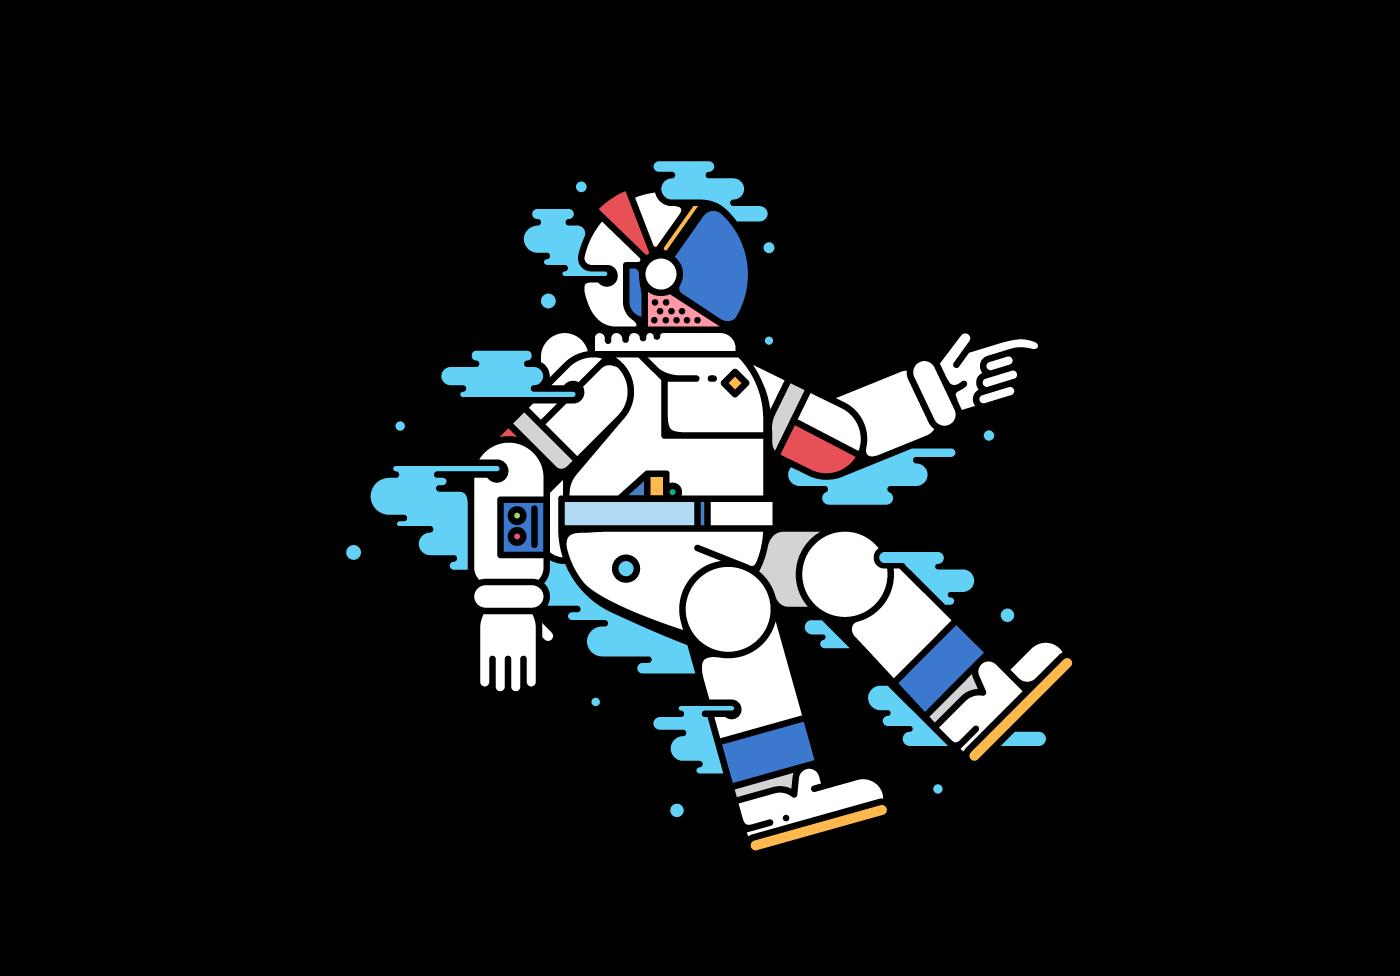 space travel astronaut everydaystuff Tyler Paris dale urquhart